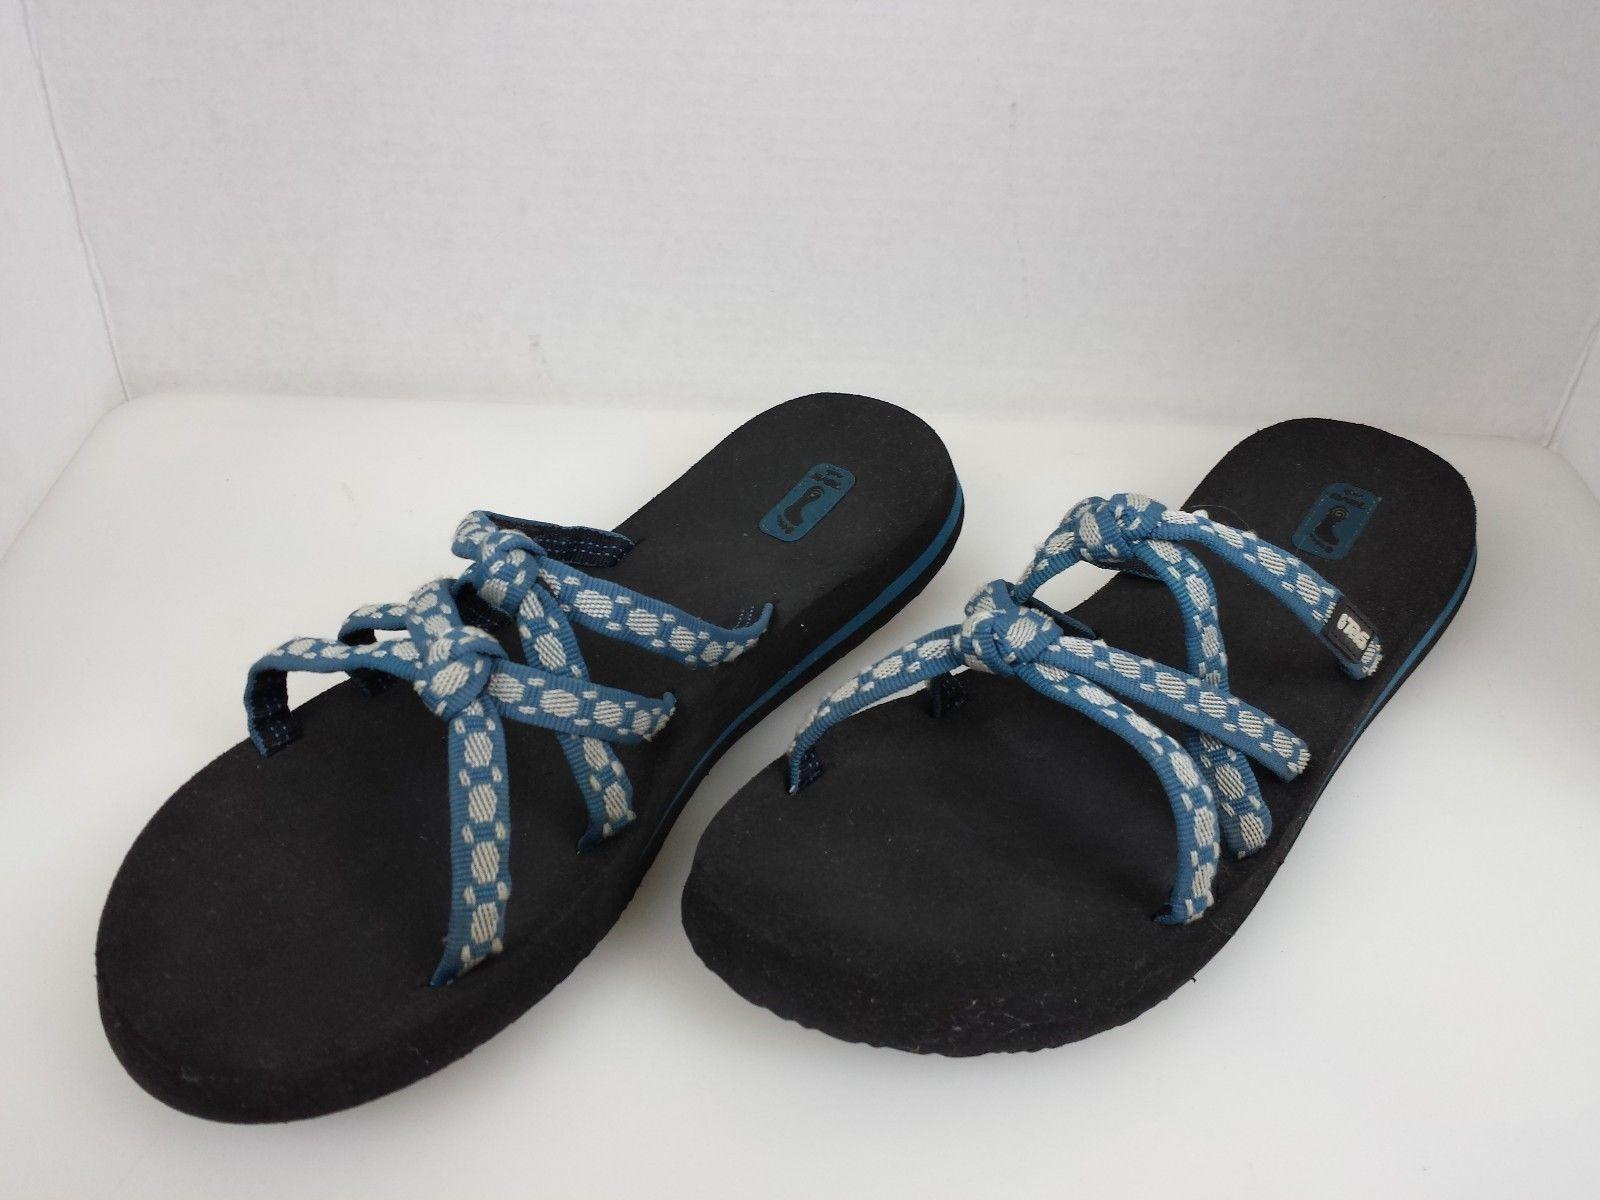 0d071344d2a Teva Womens Sandals Flip Flops Kena Mush and 50 similar items